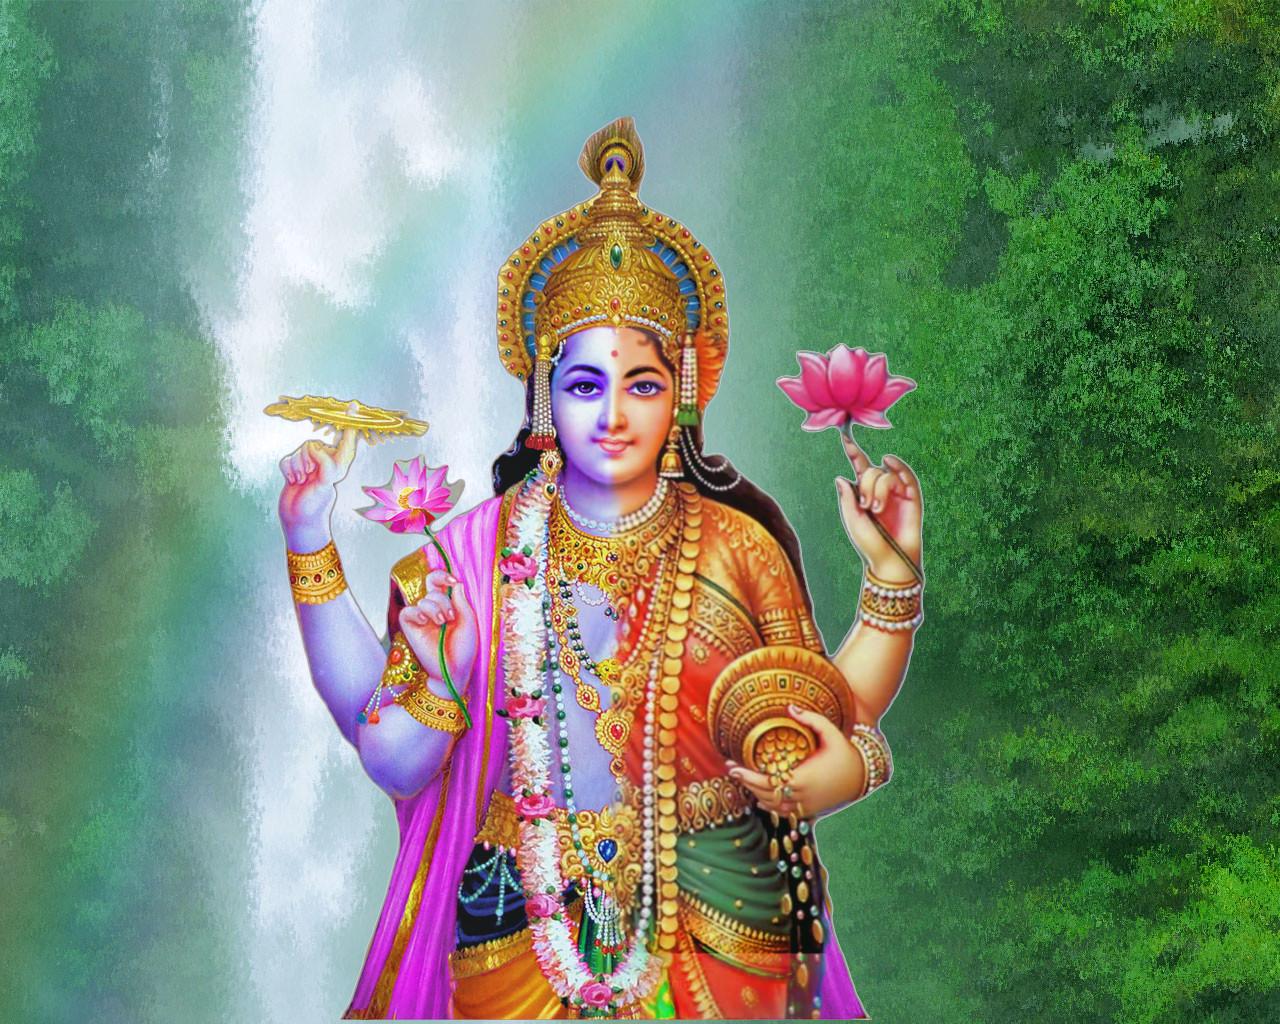 Vishnu laxmi photo download Battle Of